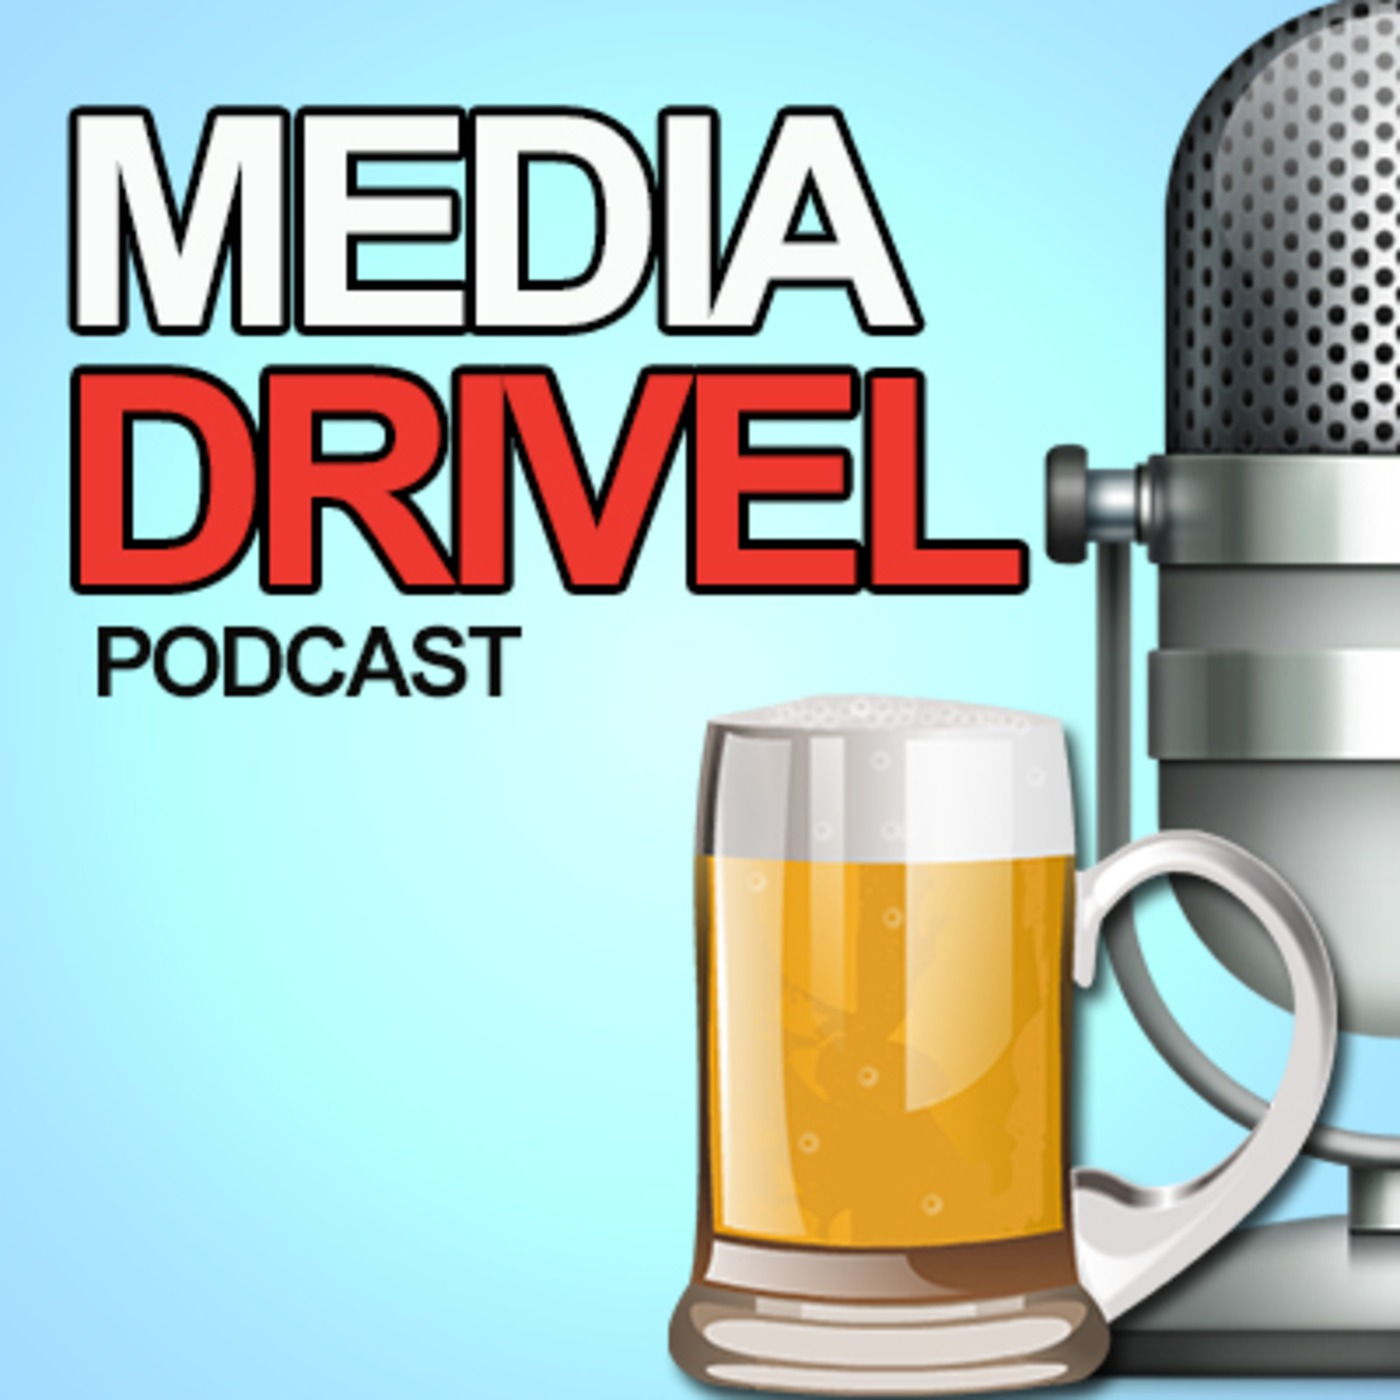 Media Drivel